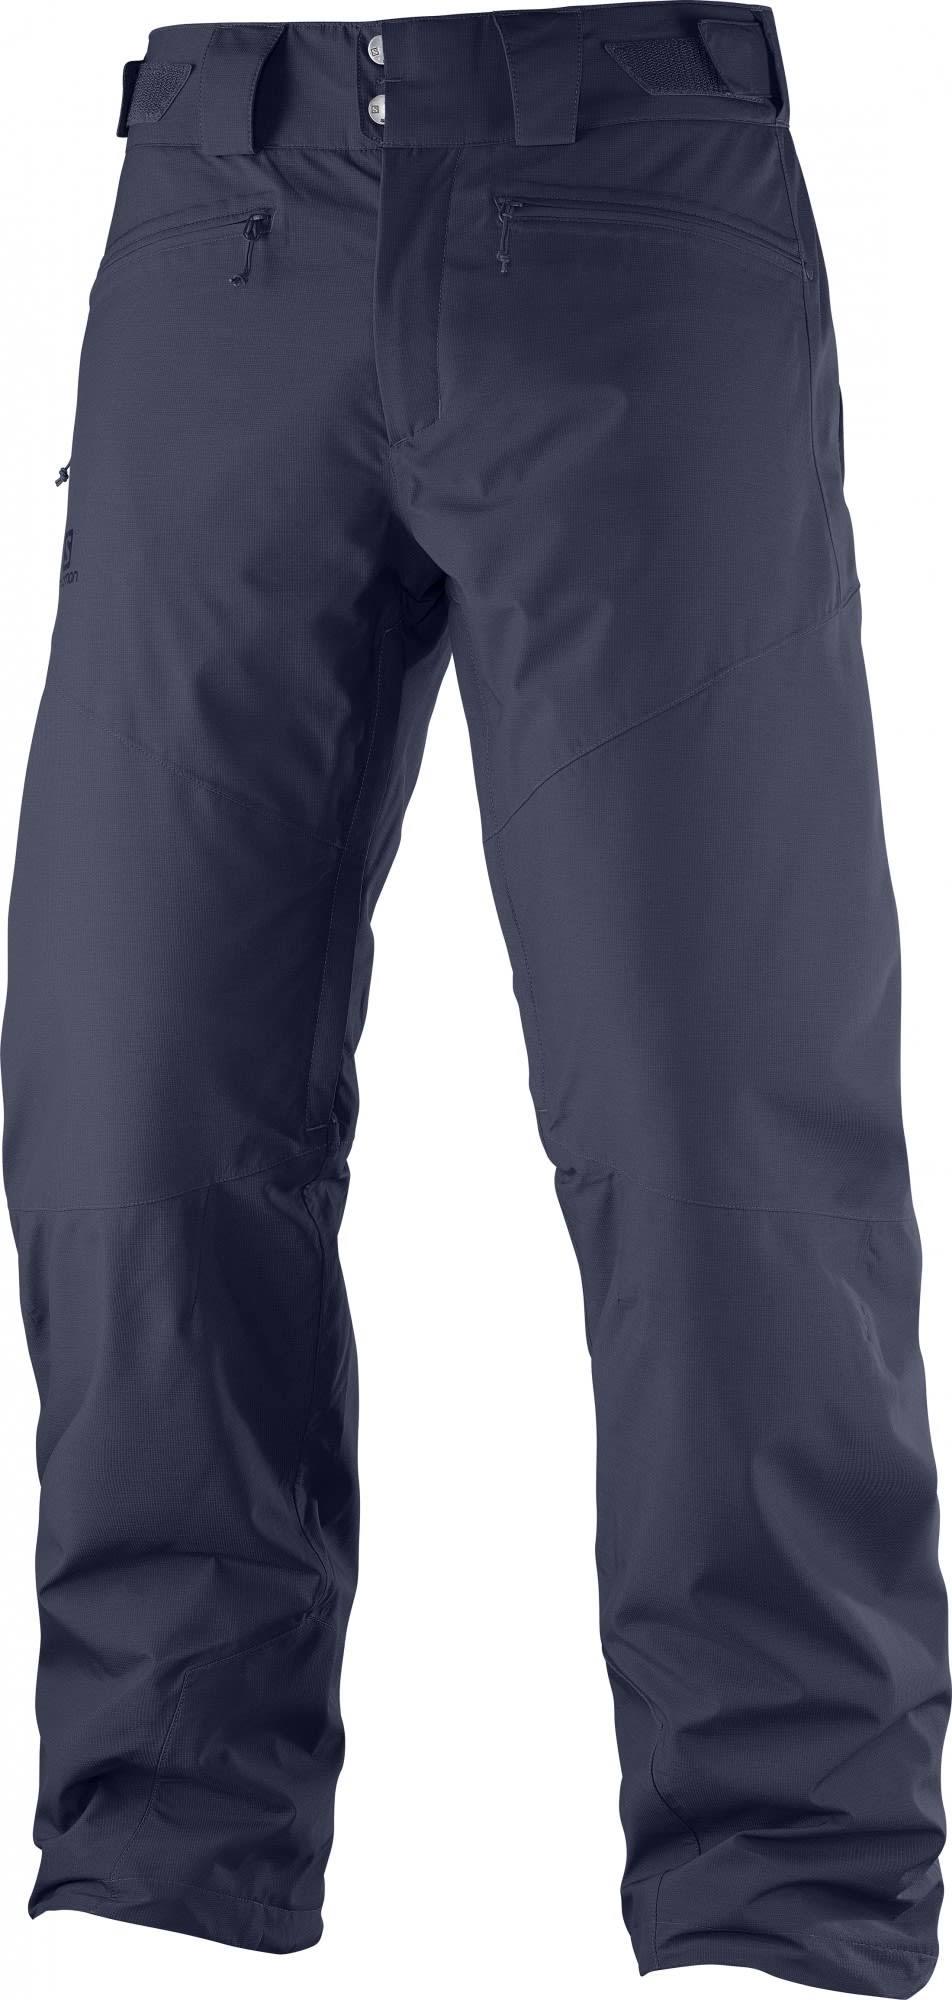 style size Heather Trousers length Blue Color 2017 Xl Pant Night Winter Mens Fantasy Salomon Full Sky awqgEzfxv